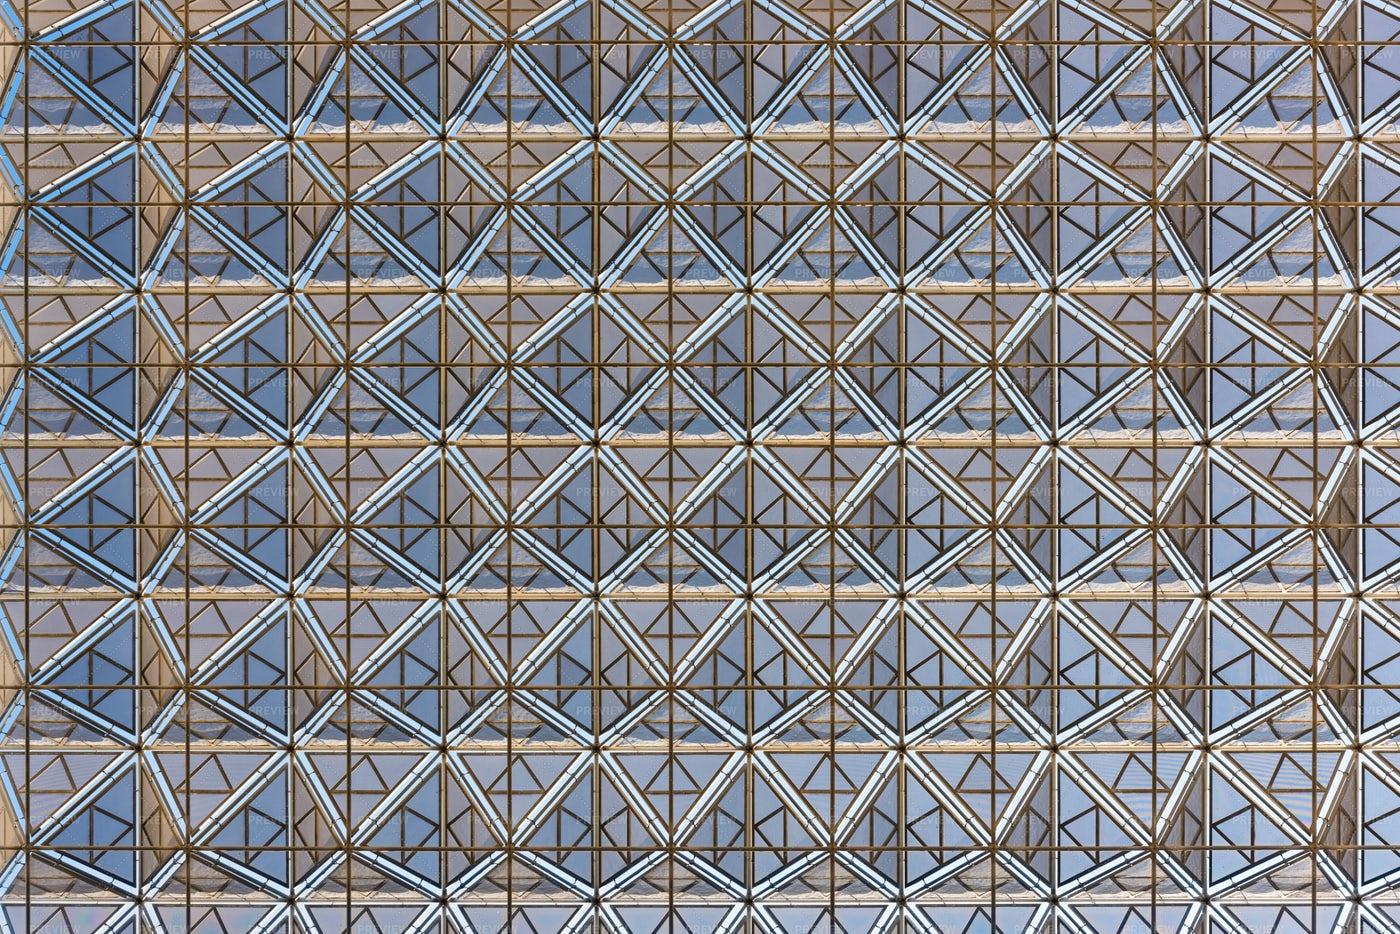 Modern Roof Geometric Design: Stock Photos